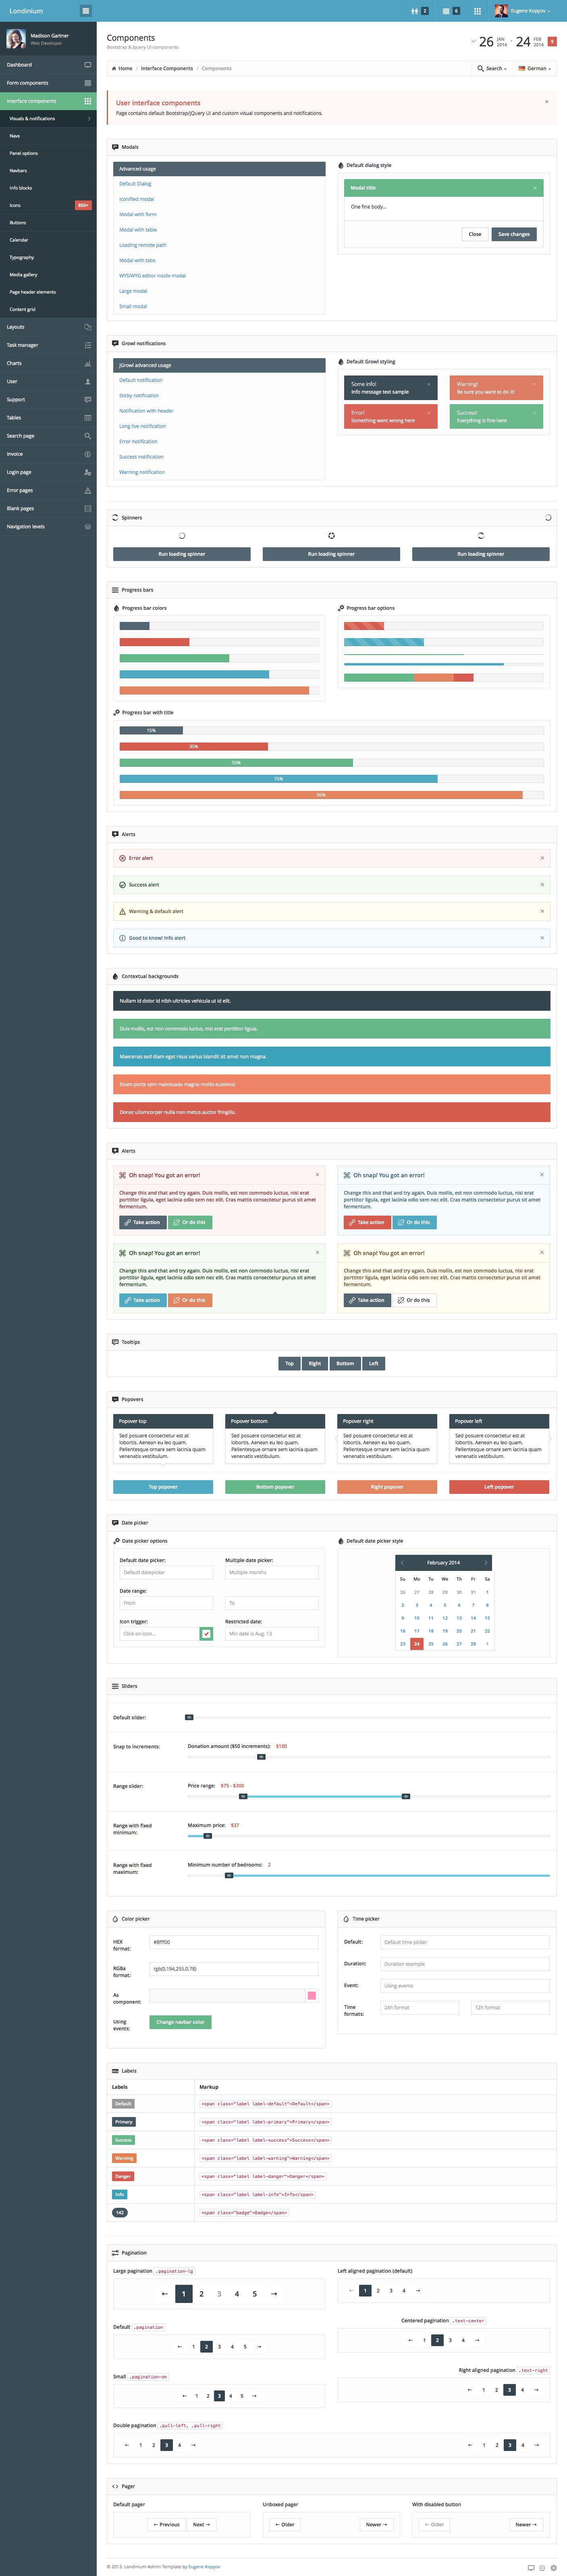 Londinium - responsive bootstrap 3 admin template